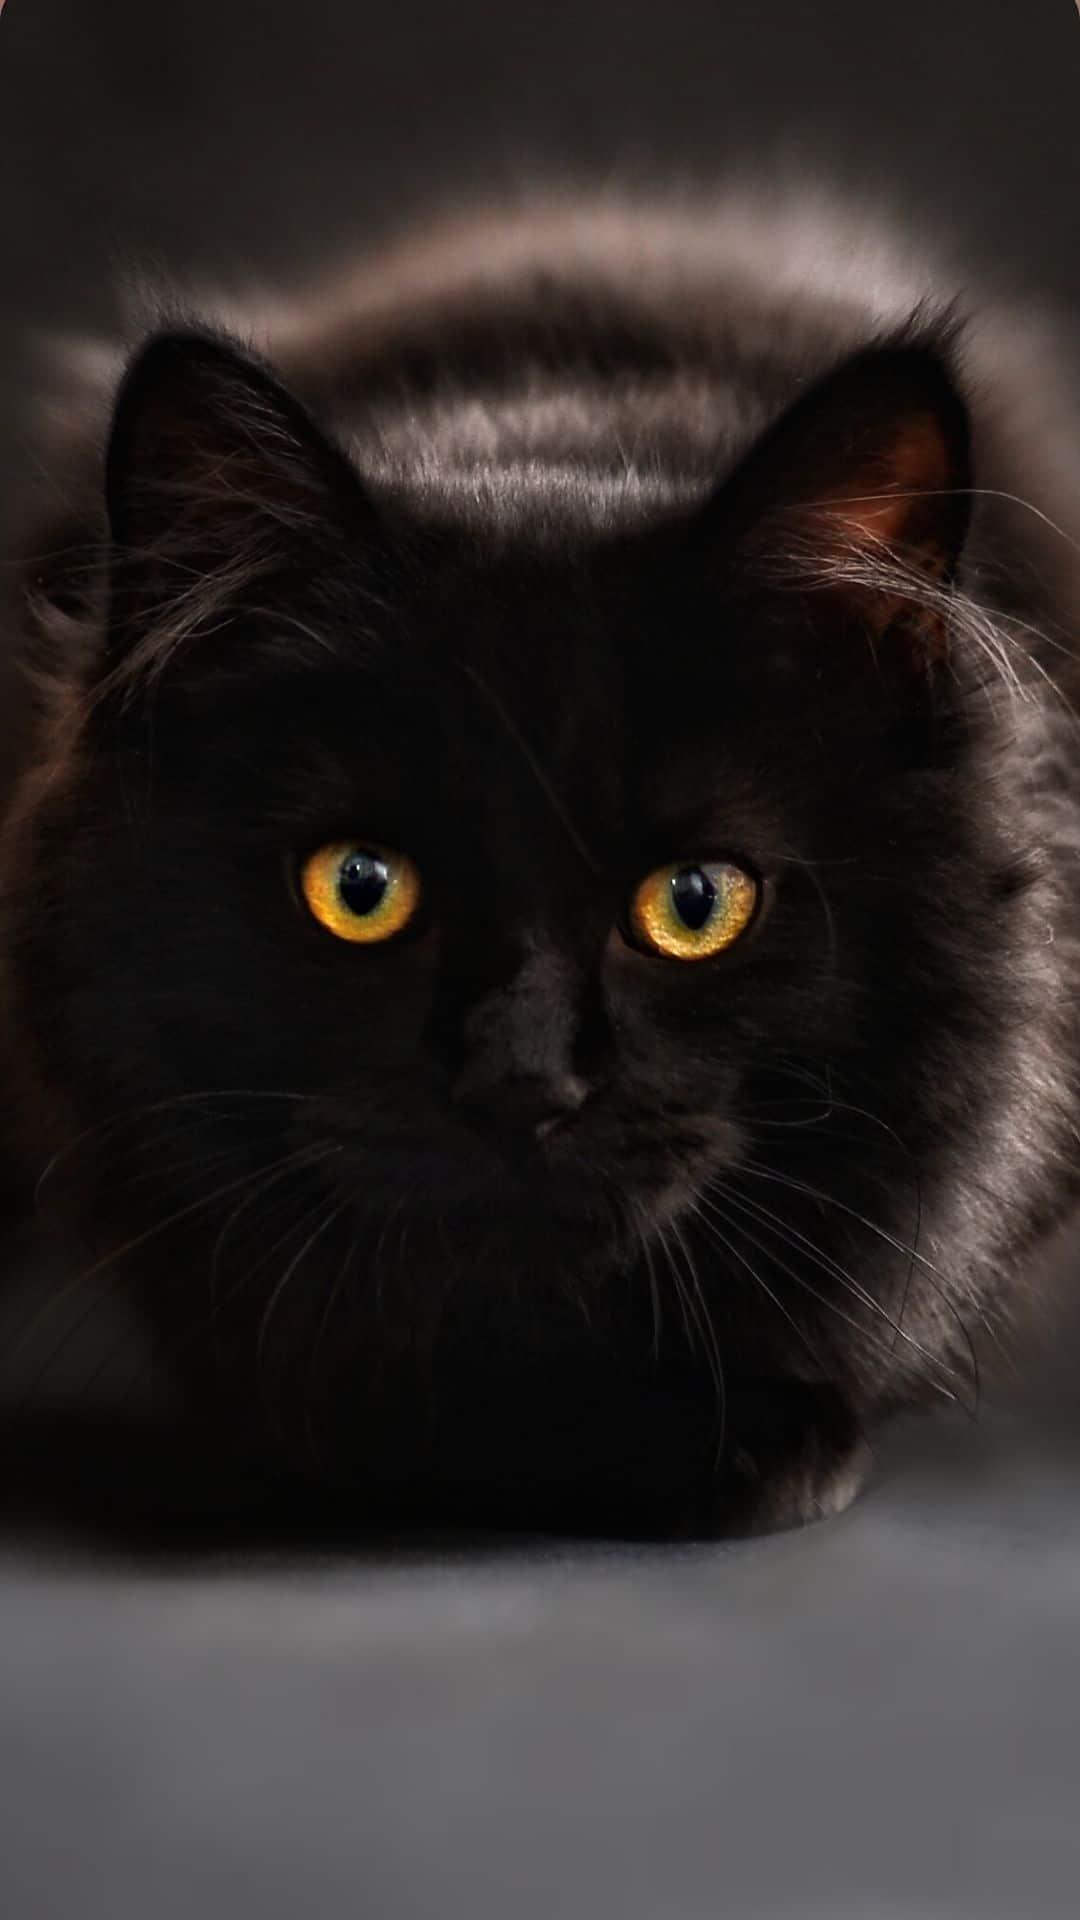 iPhone Black Cat Wallpaper stare